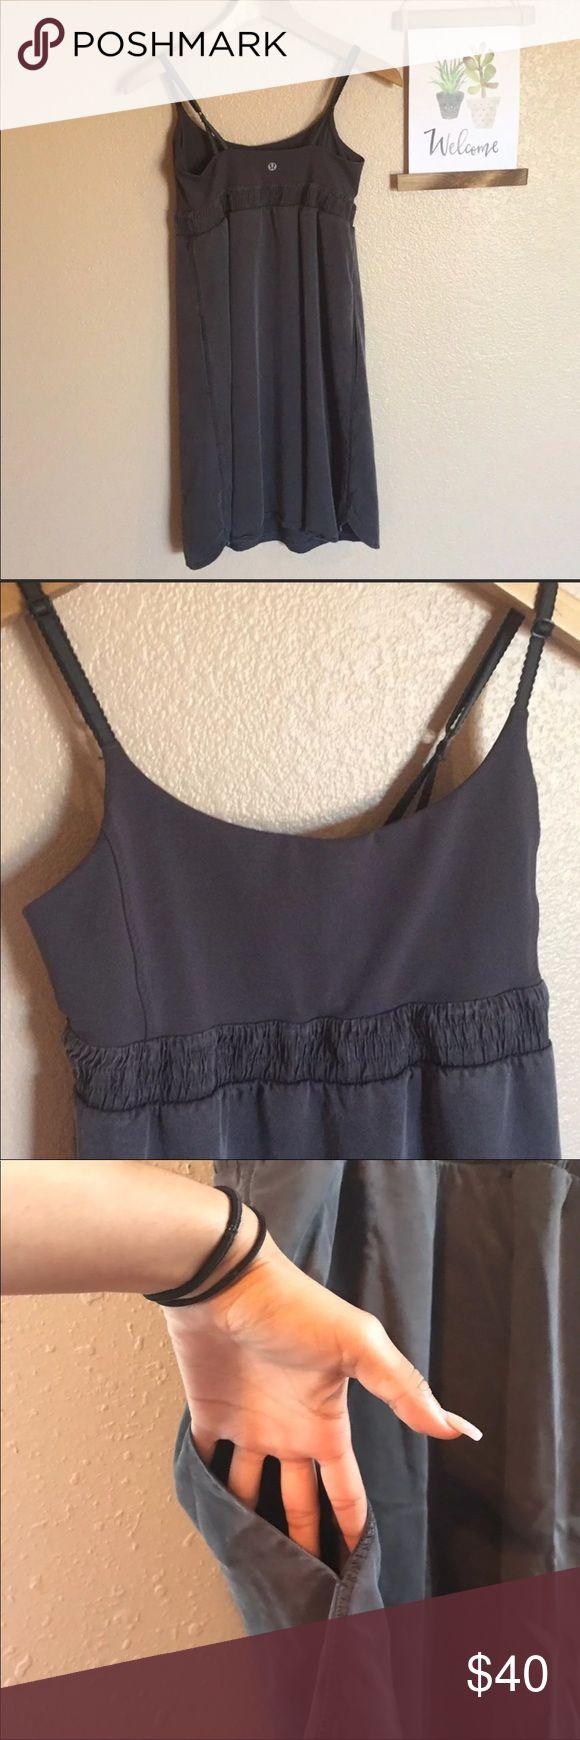 Lululemon Dress No flaws! Size 6 lululemon athletica Dresses Mini